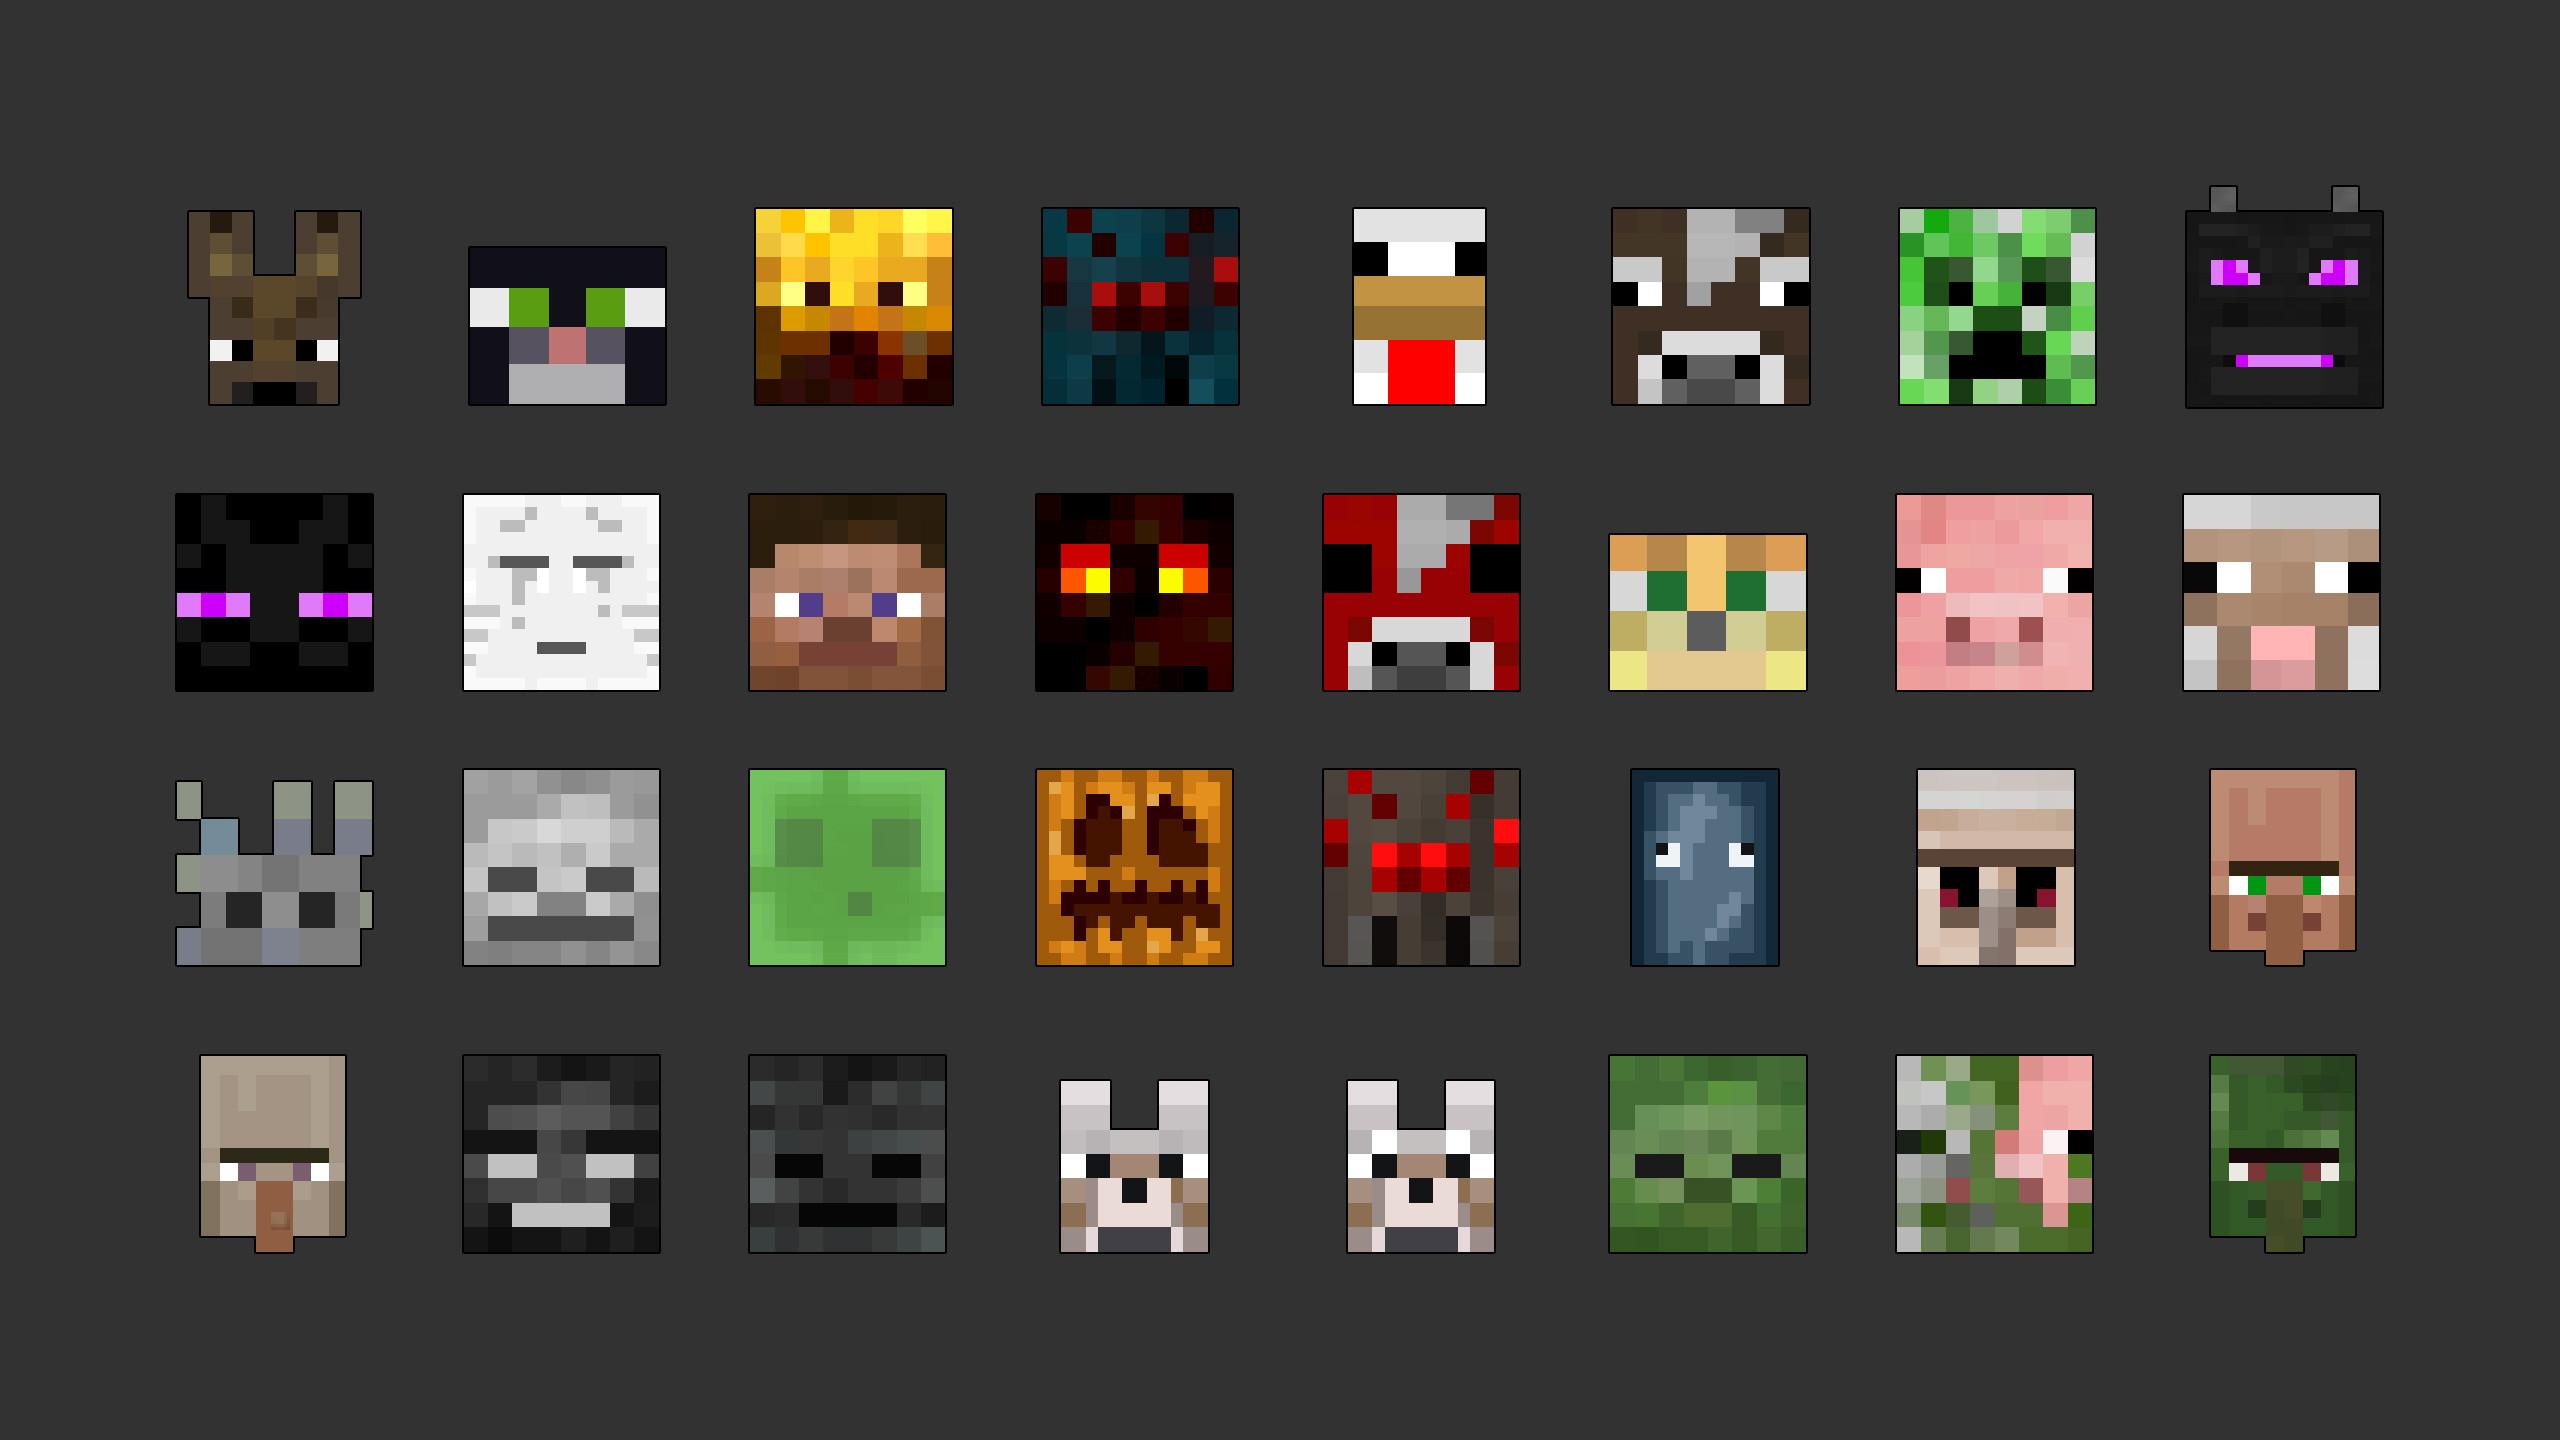 Wonderful Wallpaper Minecraft Laptop - Minecraft-Laptop-Backgrounds-014  Trends_645176.jpg